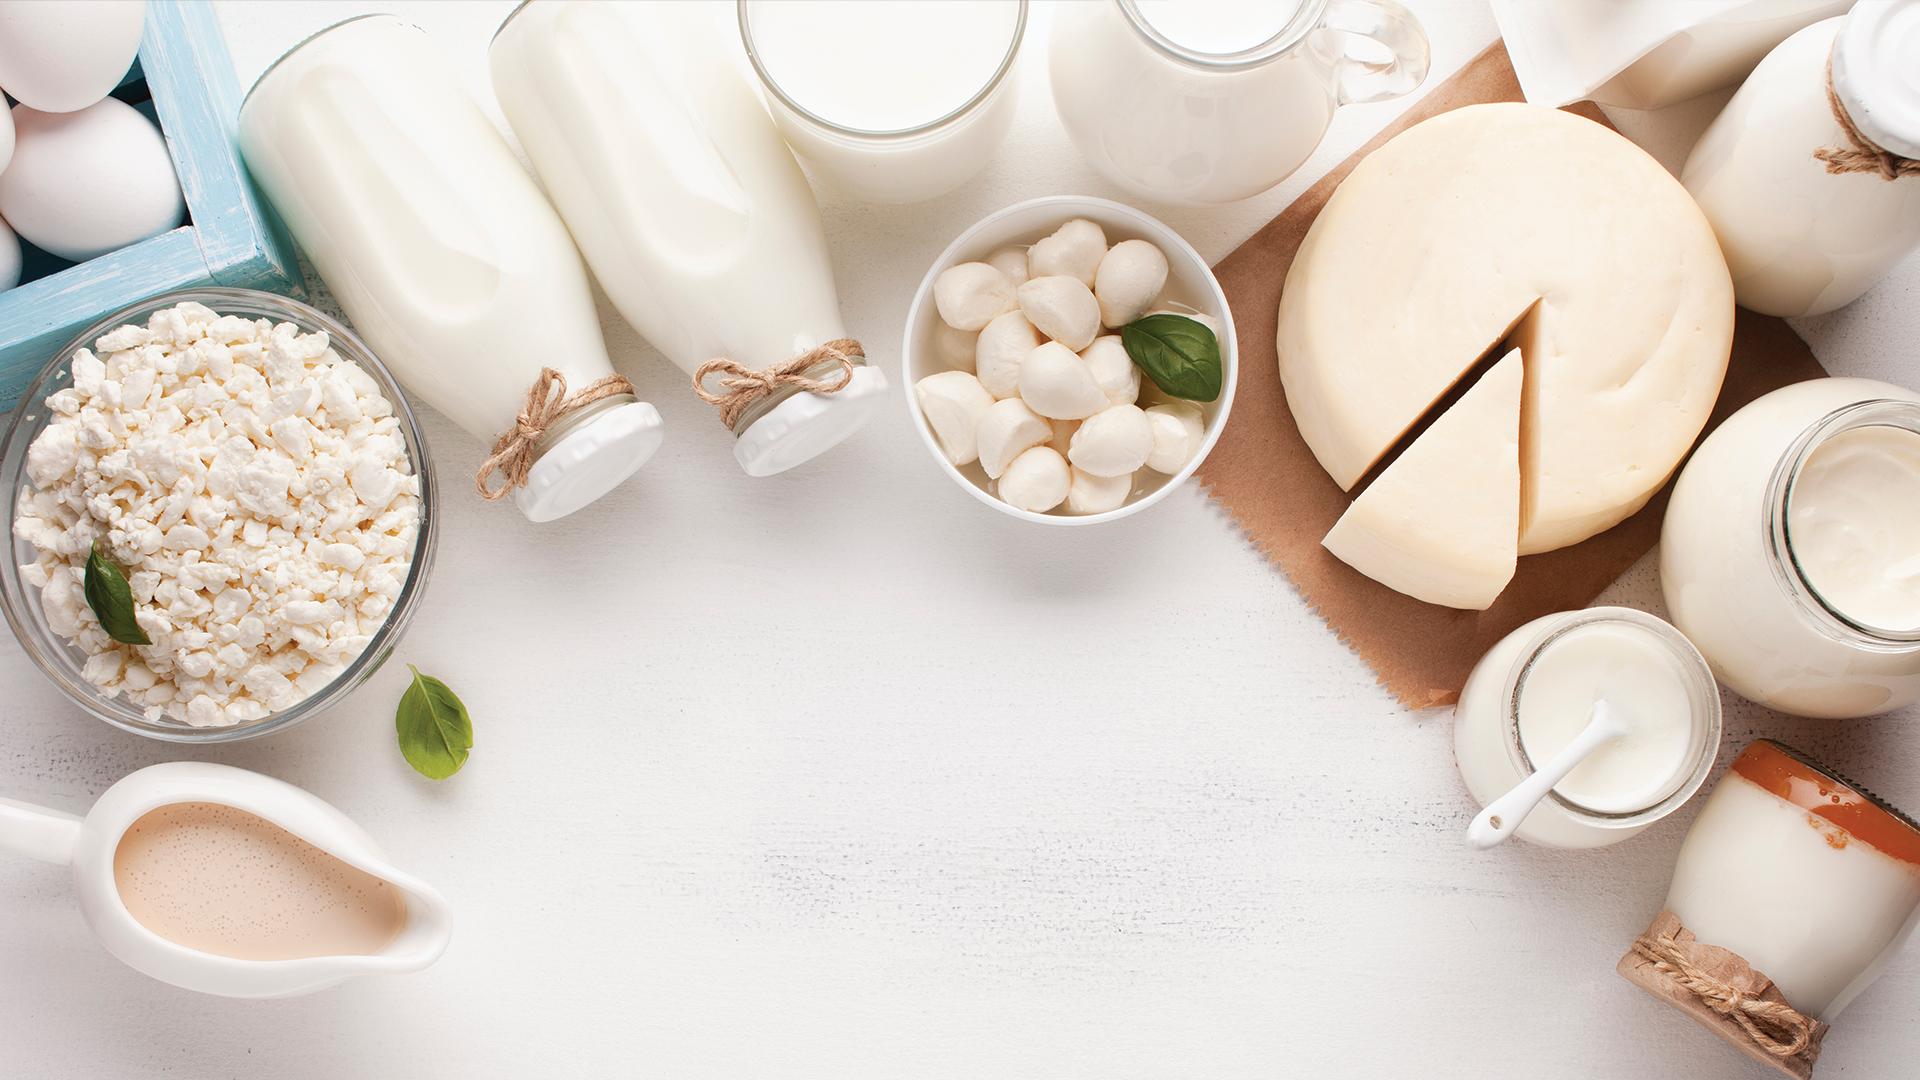 Como a deficiência de cálcio e de vitamina D pode afetar seus dentes